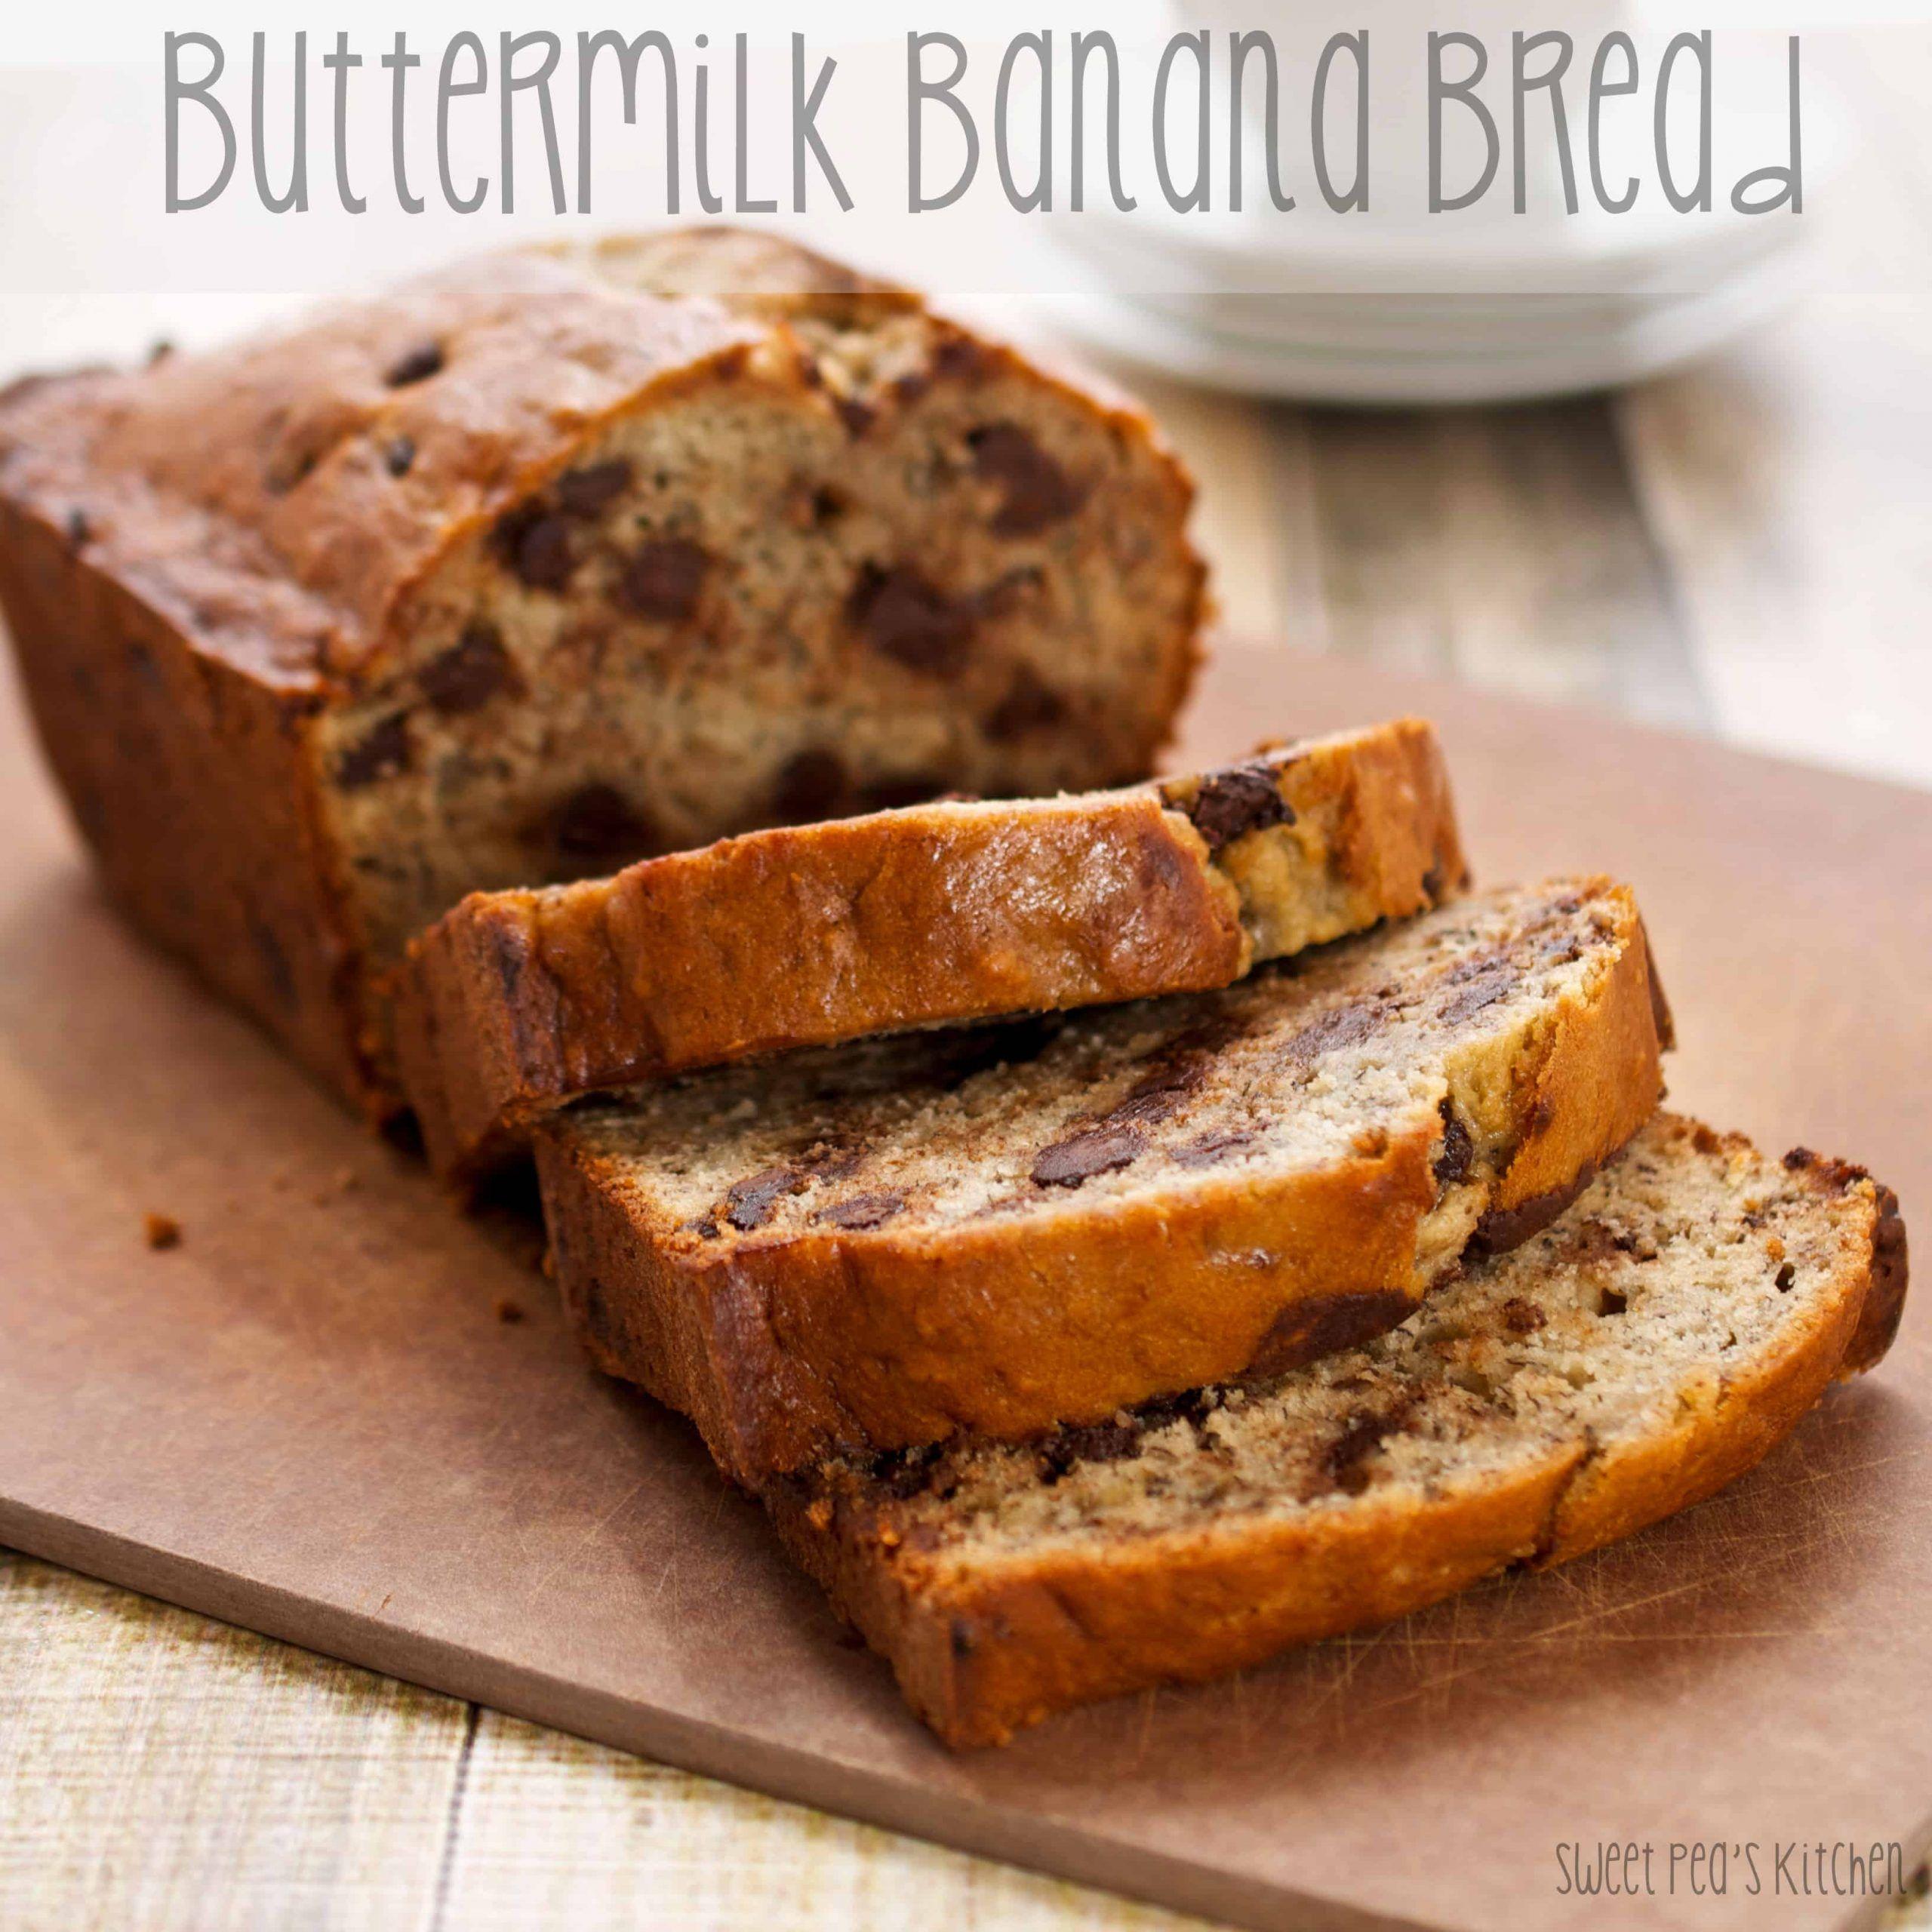 Buttermilk Banana Bread Recipe In 2020 Buttermilk Banana Bread Best Banana Bread Banana Recipes